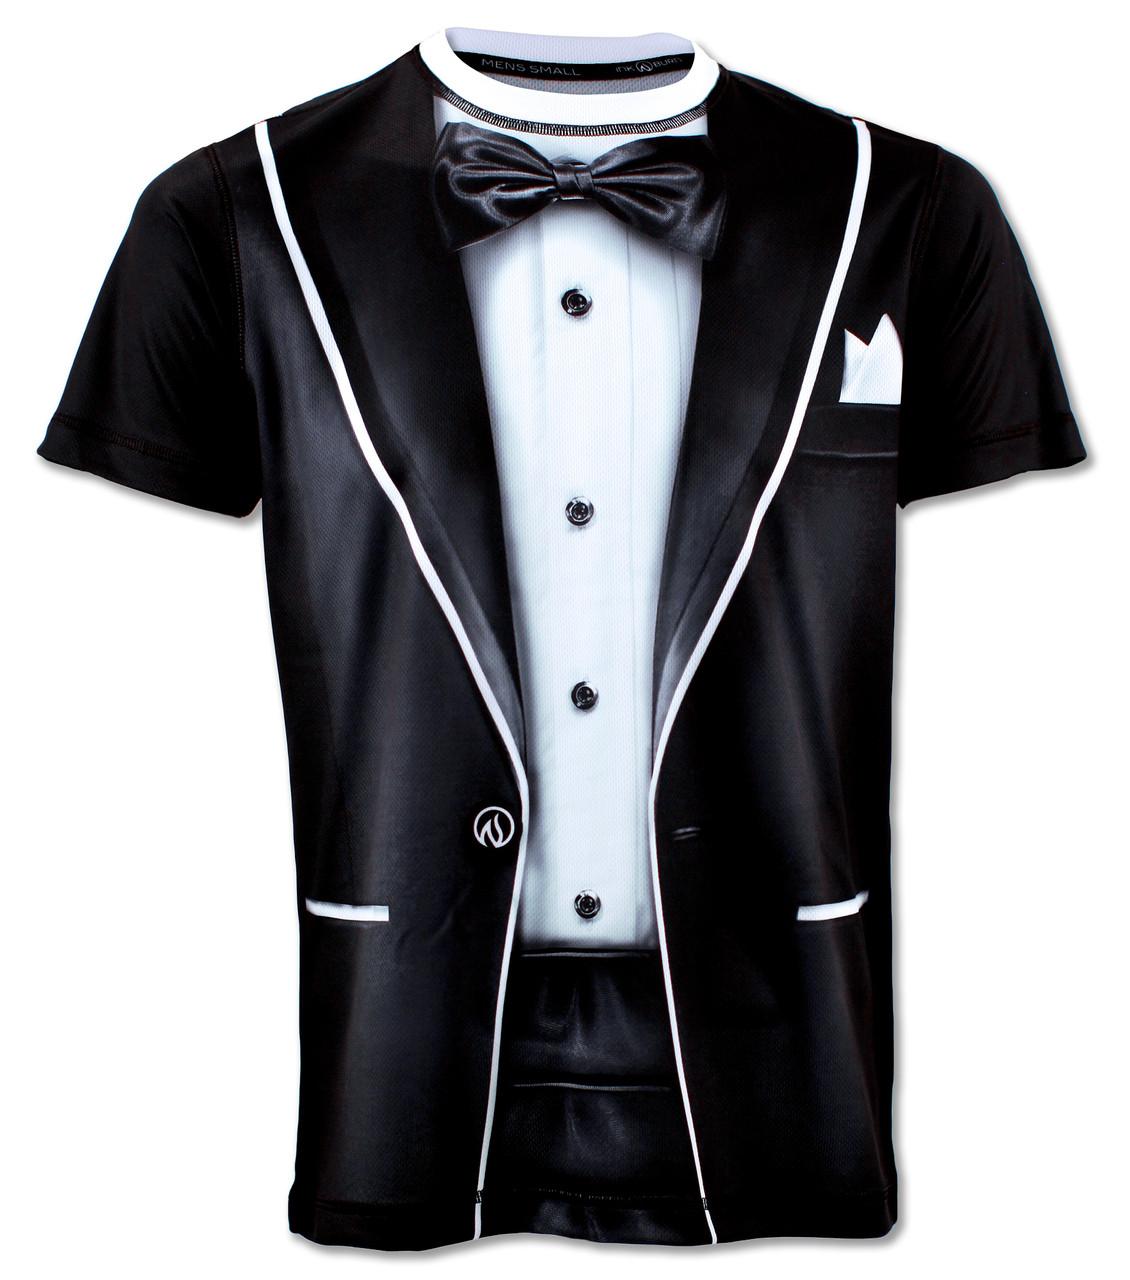 INKnBURN Mens Tuxedo Running Shirt - Front